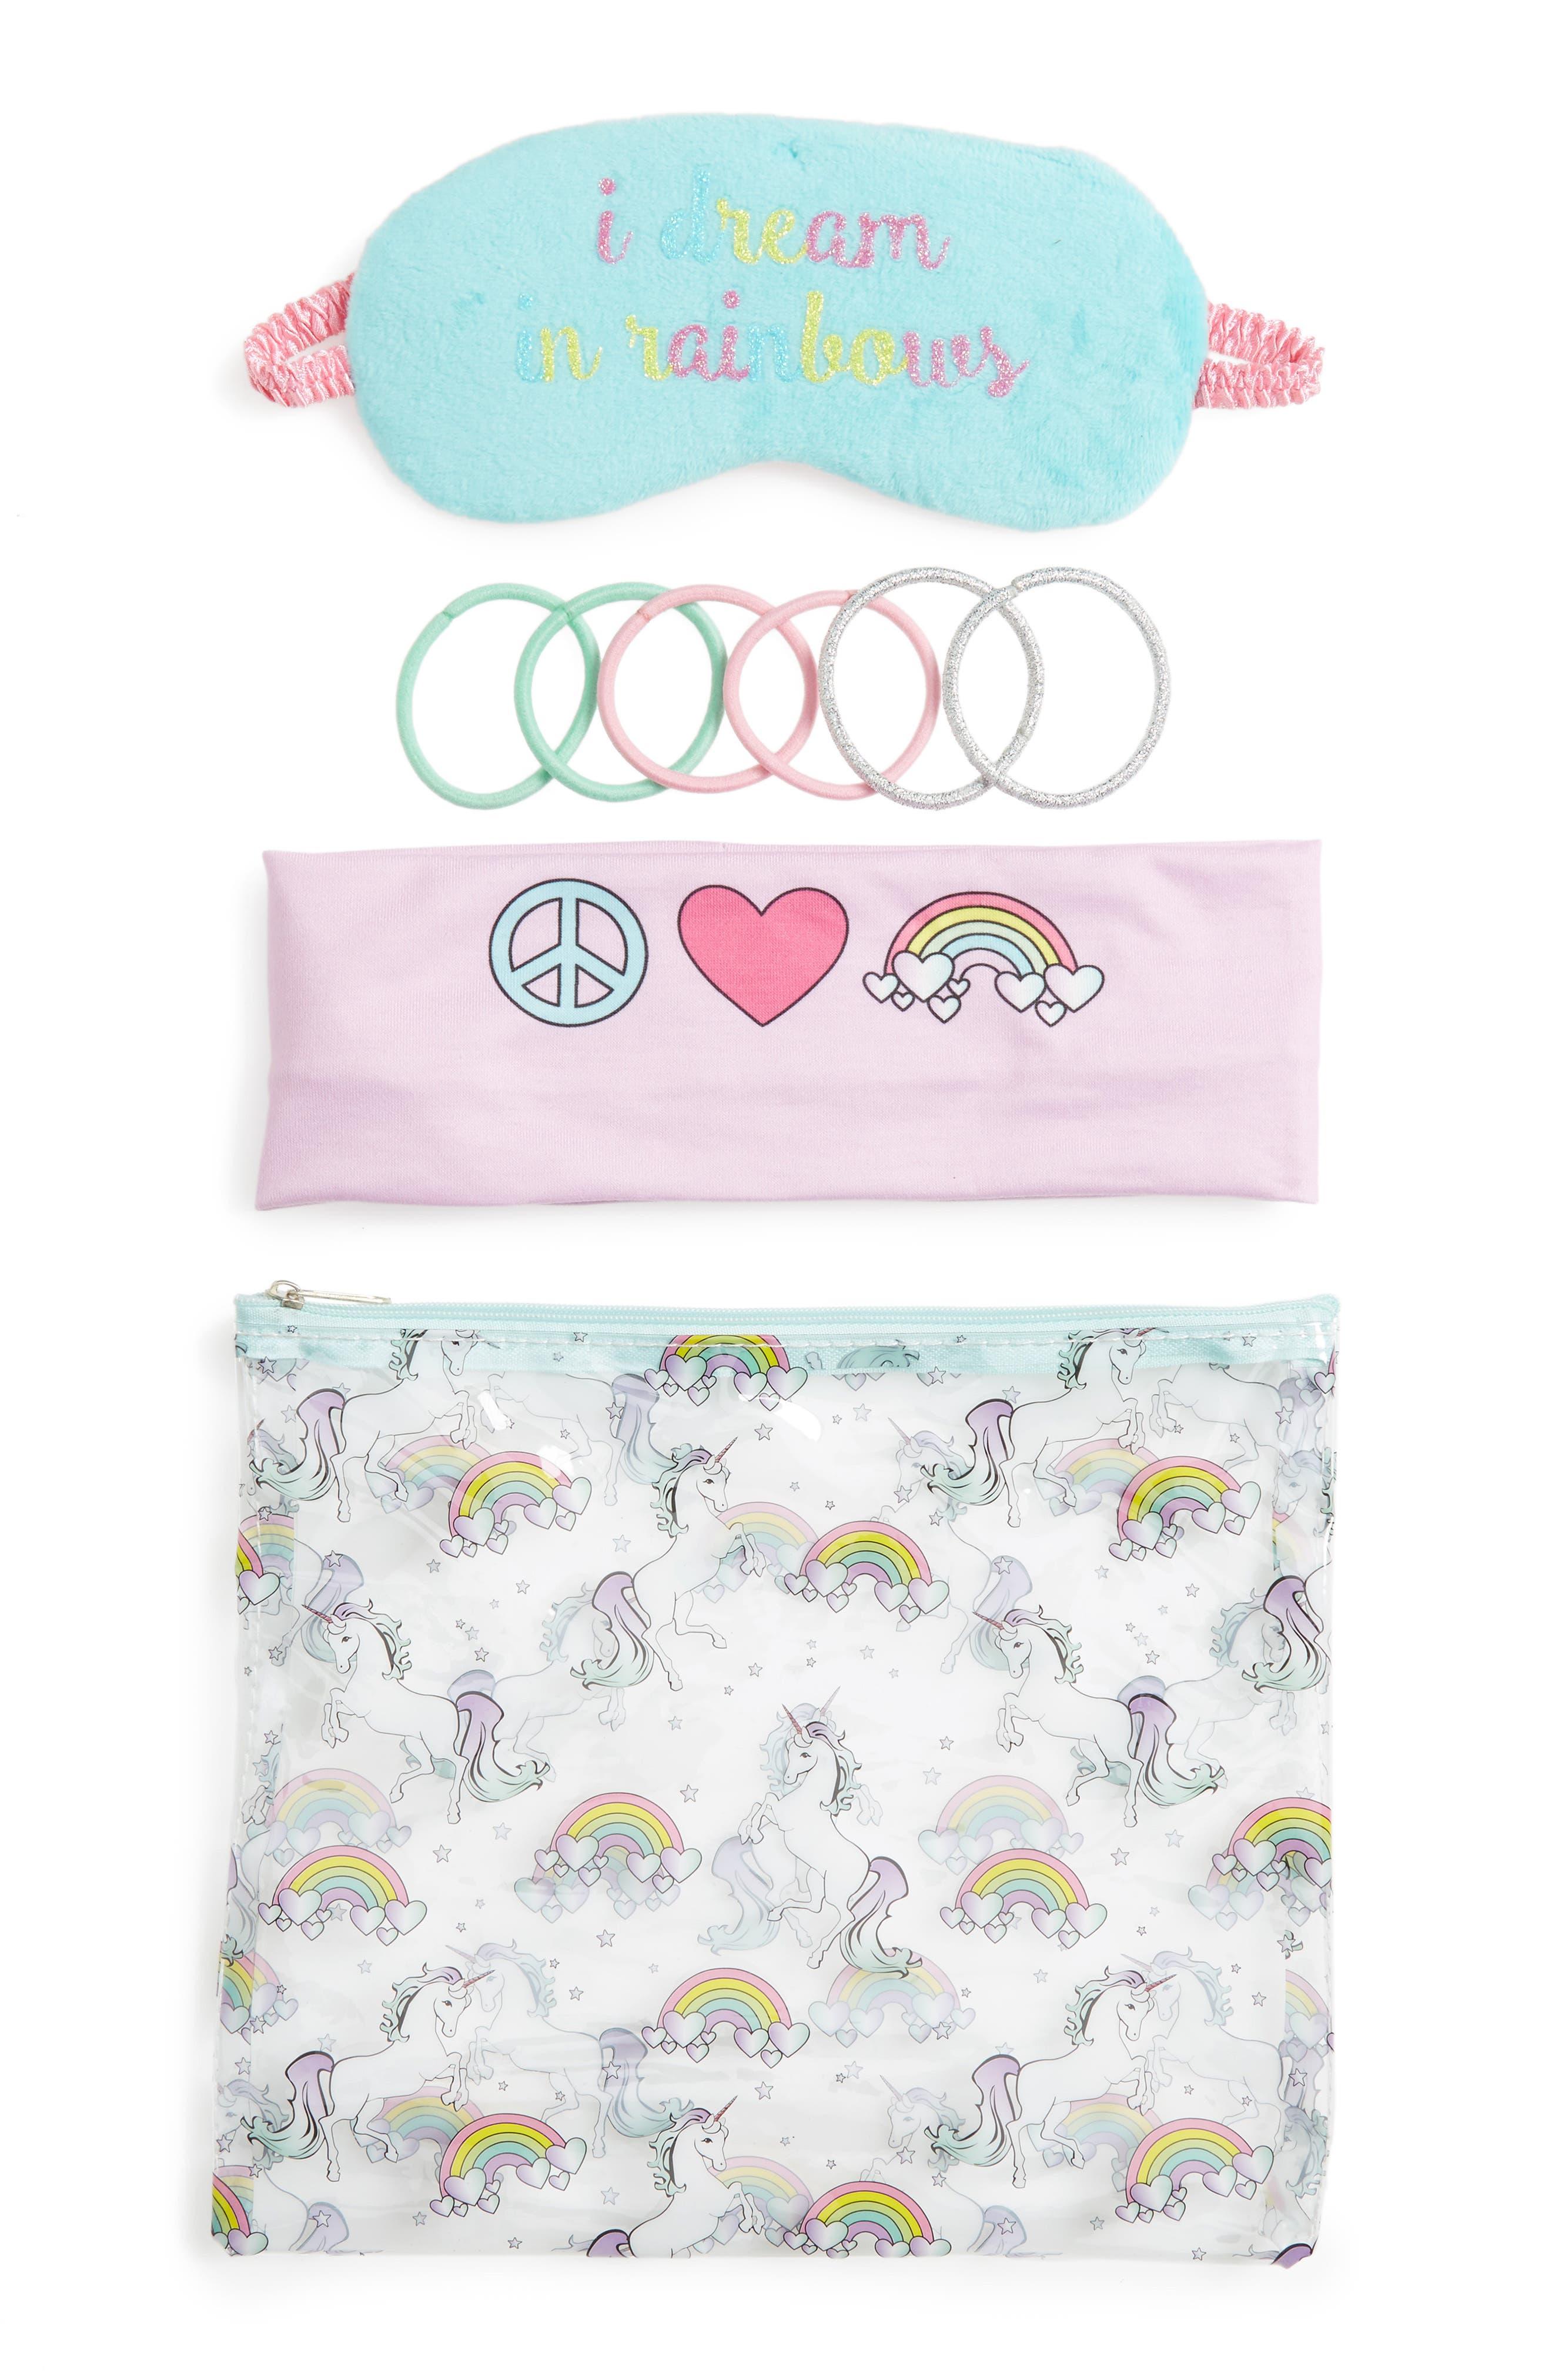 Capelli of New York 4-Piece Unicorns & Rainbows Sleepover Set (Girls)